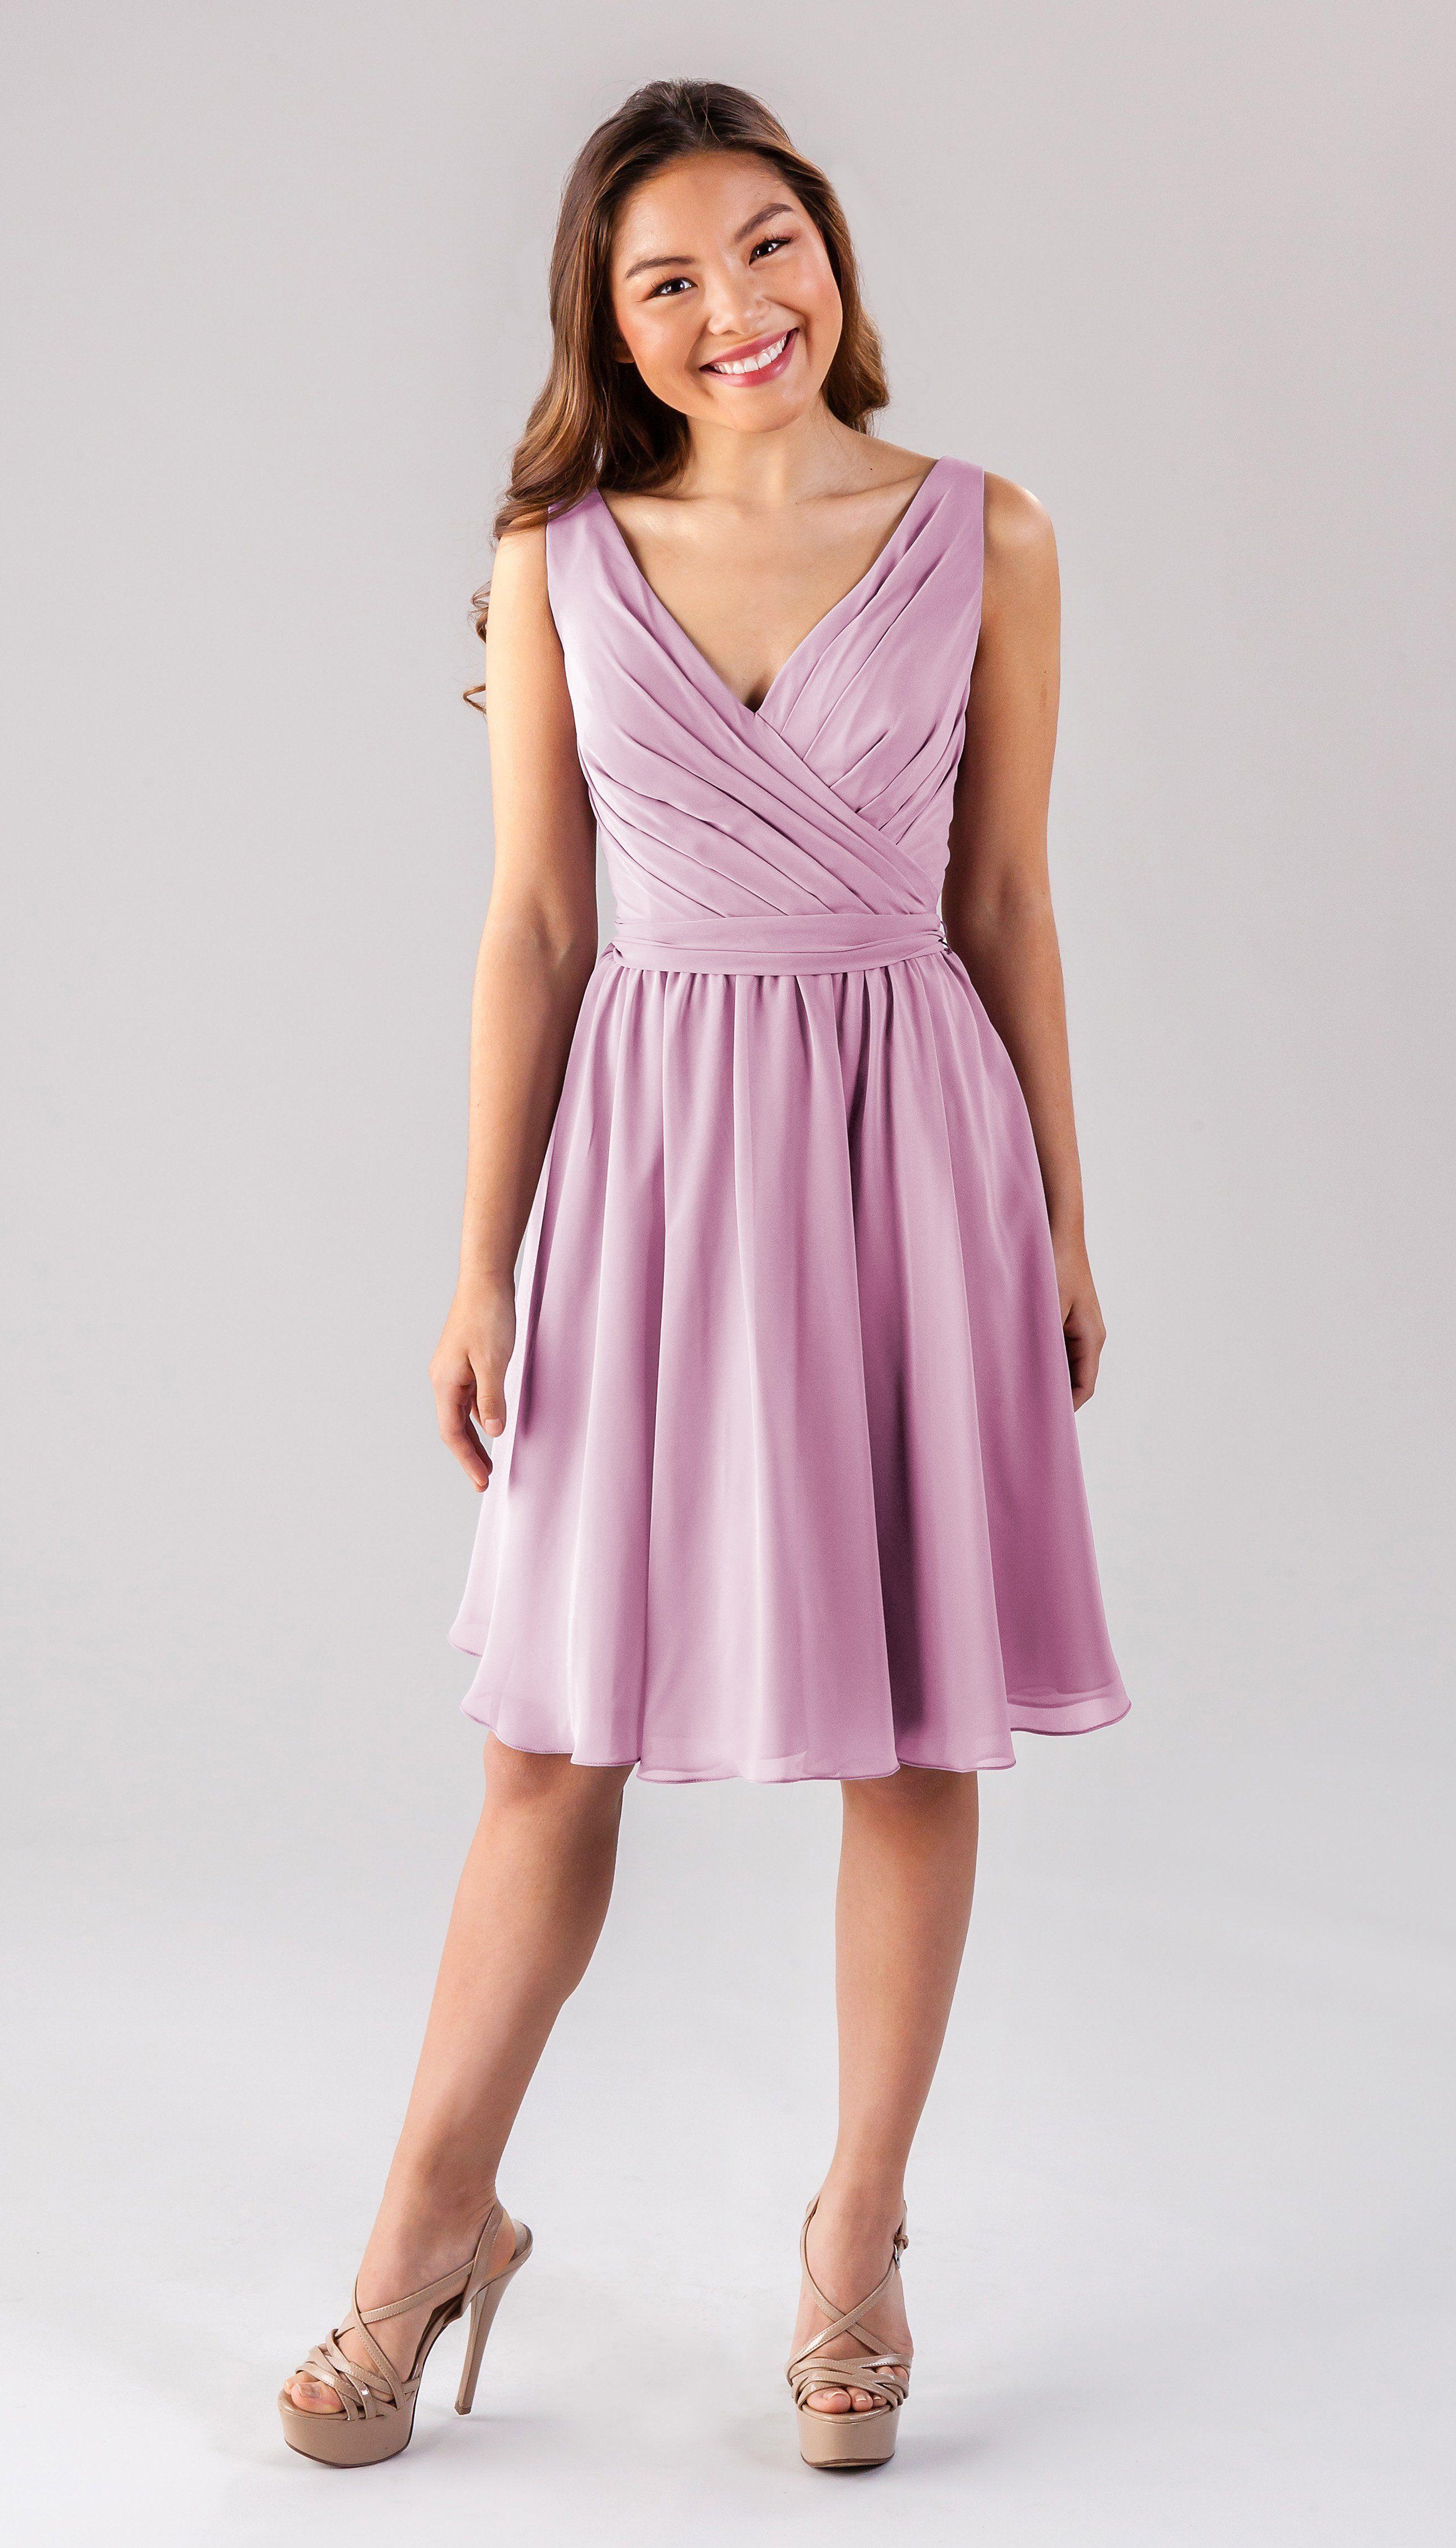 Faith | Peony, Chiffon bridesmaid dresses and Wedding planning ...